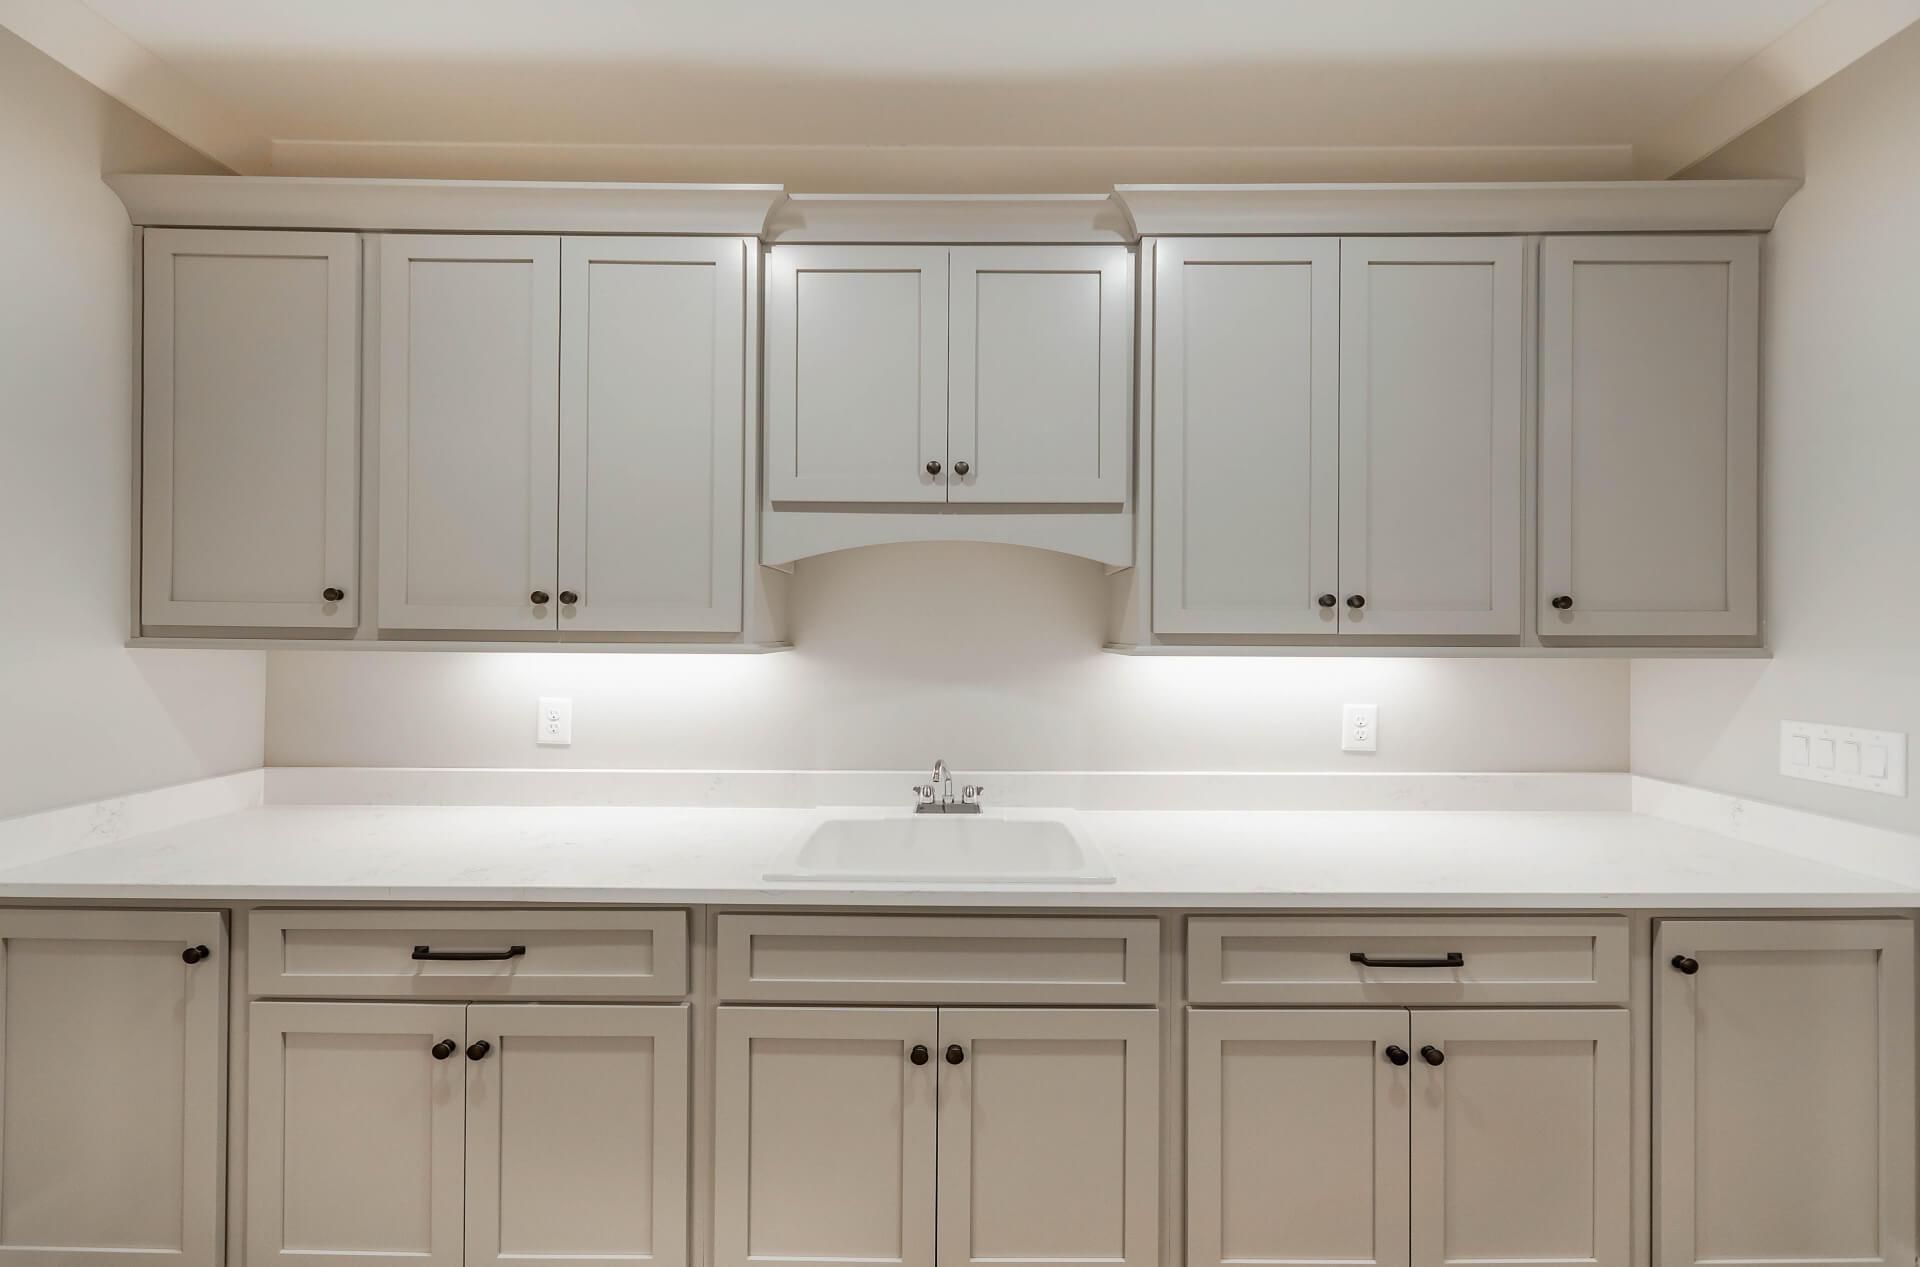 Custom-cabinet-laundry-room-shaker-bronze-handles-white-countertops-quartz-1